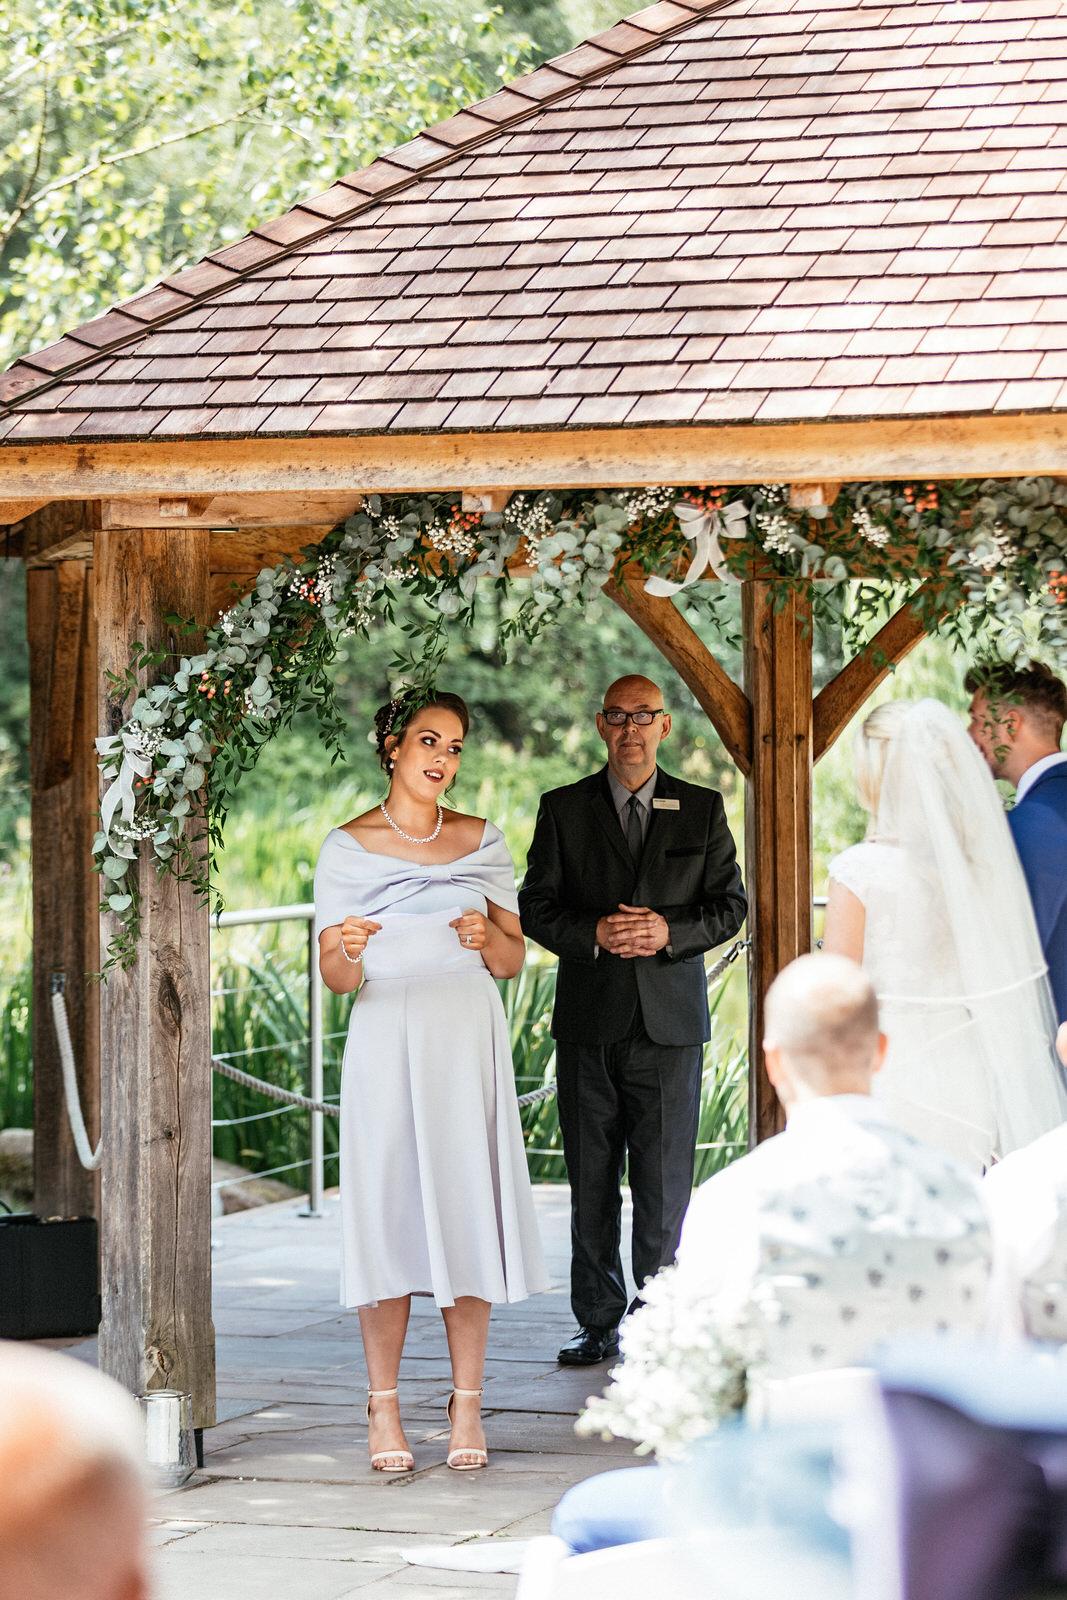 Moddershall-Oaks-Spa-Wedding-Photographer-022.jpg